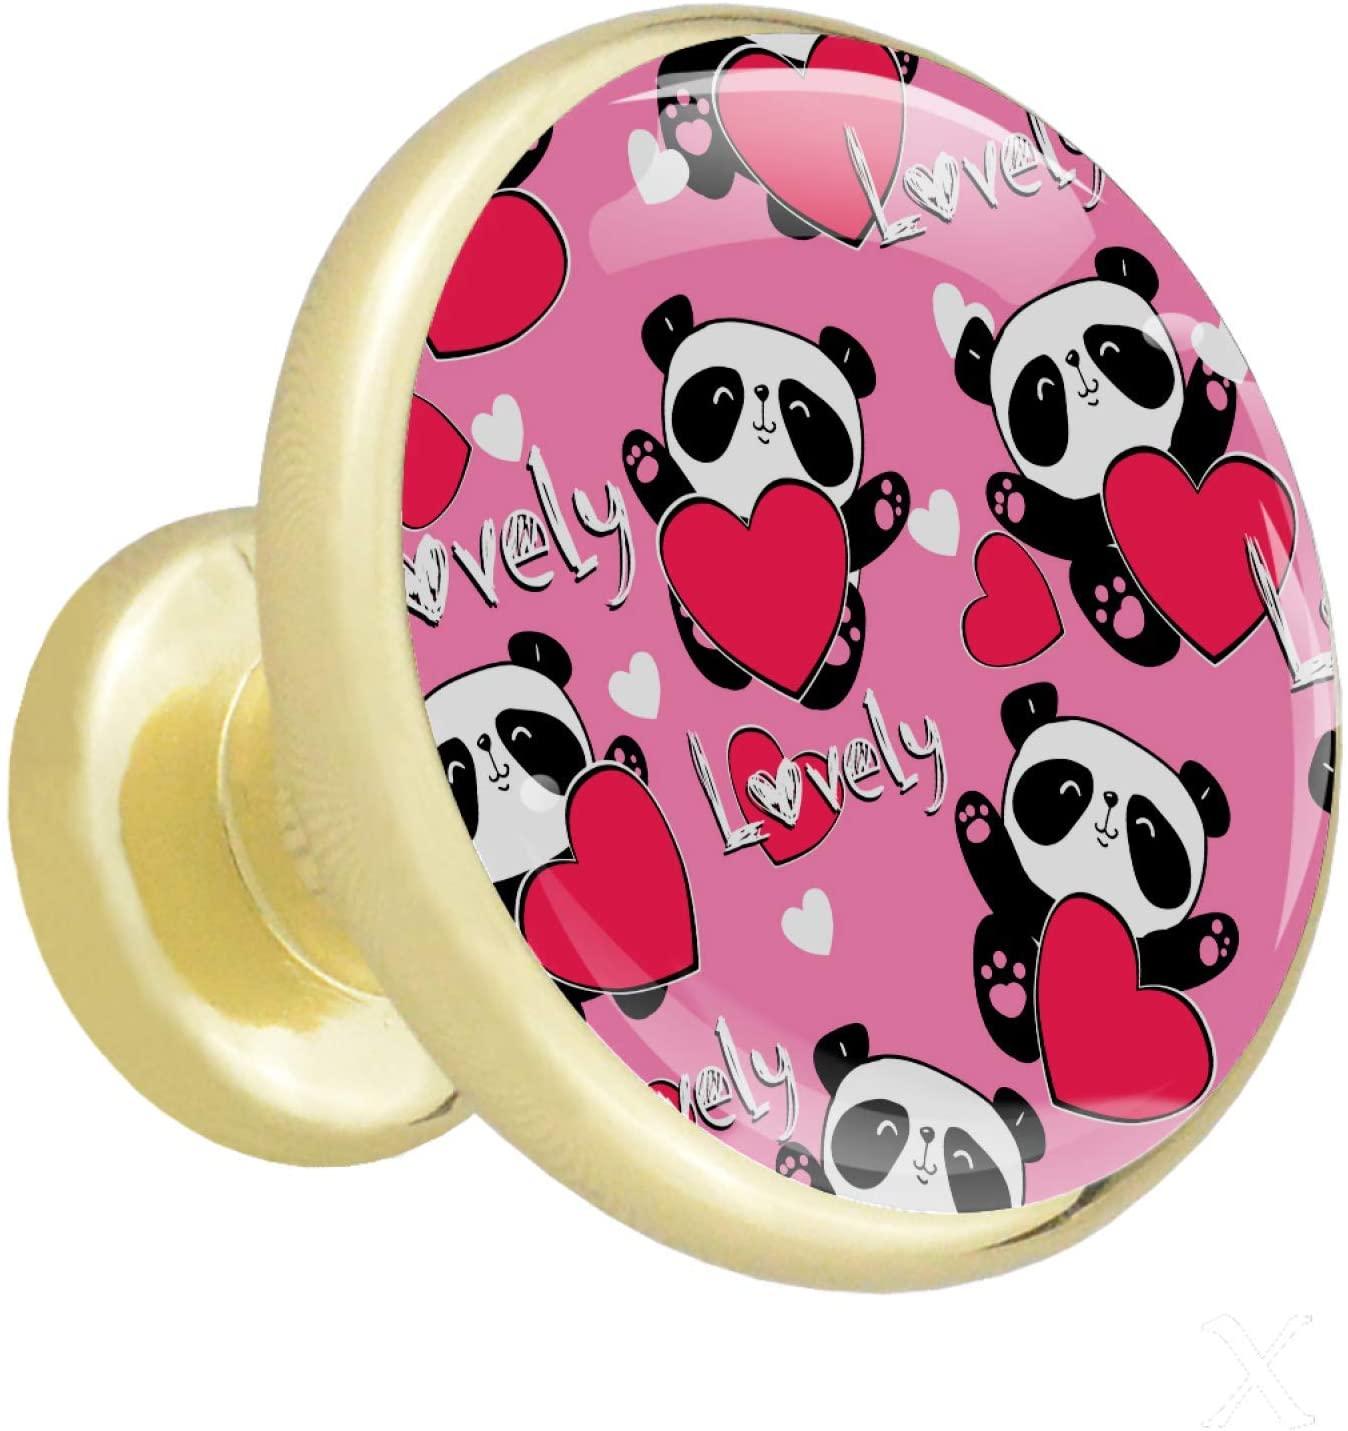 Lenergy Drawer Knobs Cartoon Cute Panda Furniture Drawer Pull Knob Cabinet Kitchen Handle Kids Bedroom Cabinet Dresser Knobs Pulls Pack of 4 1.26x1.18x0.66in